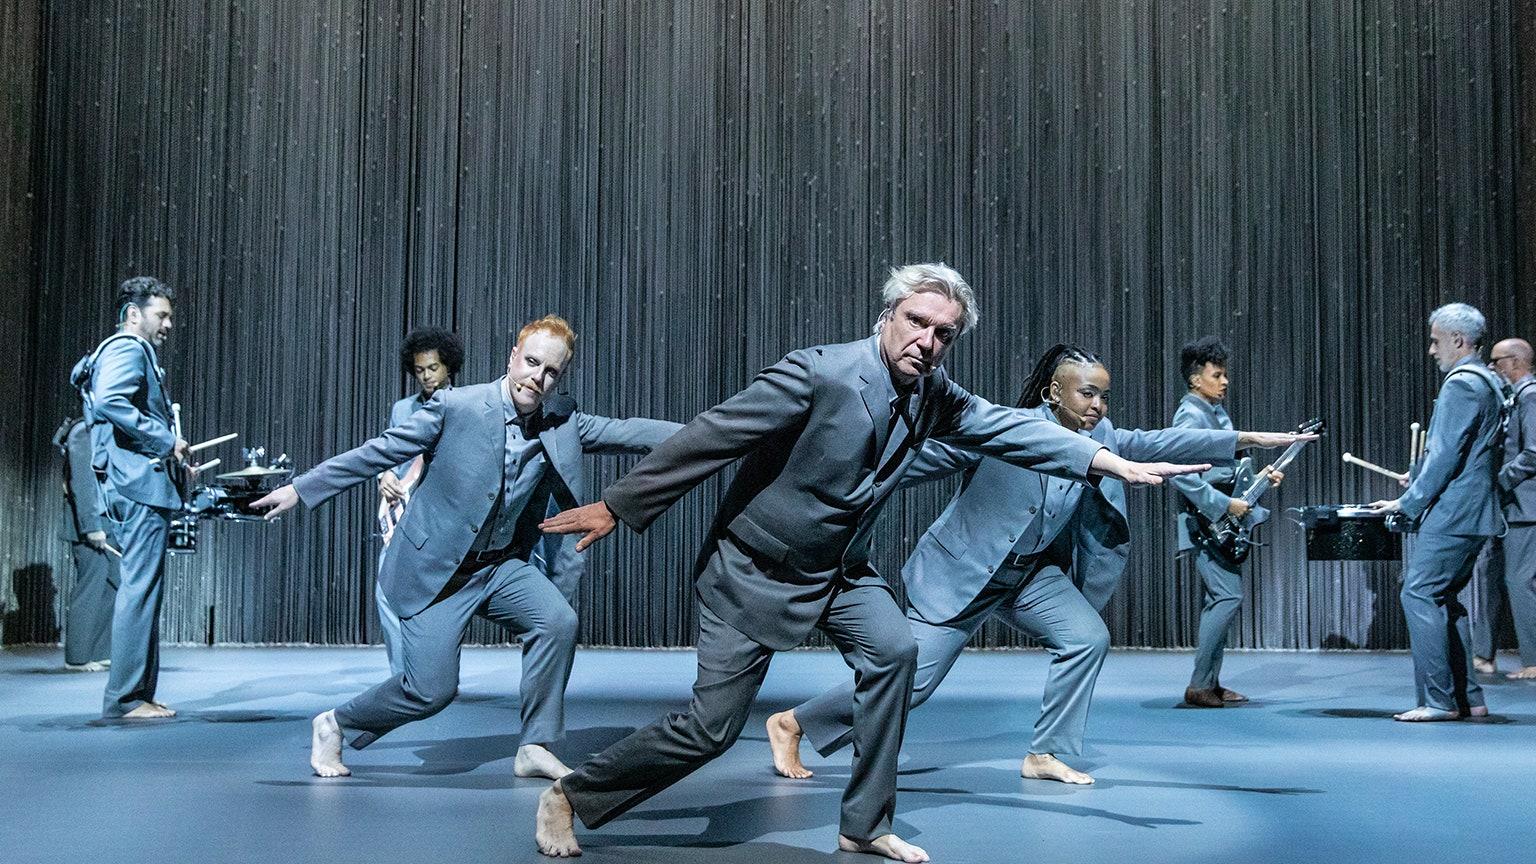 Dancing barefoot in David Byrne's American Utopia directed by Spike Lee